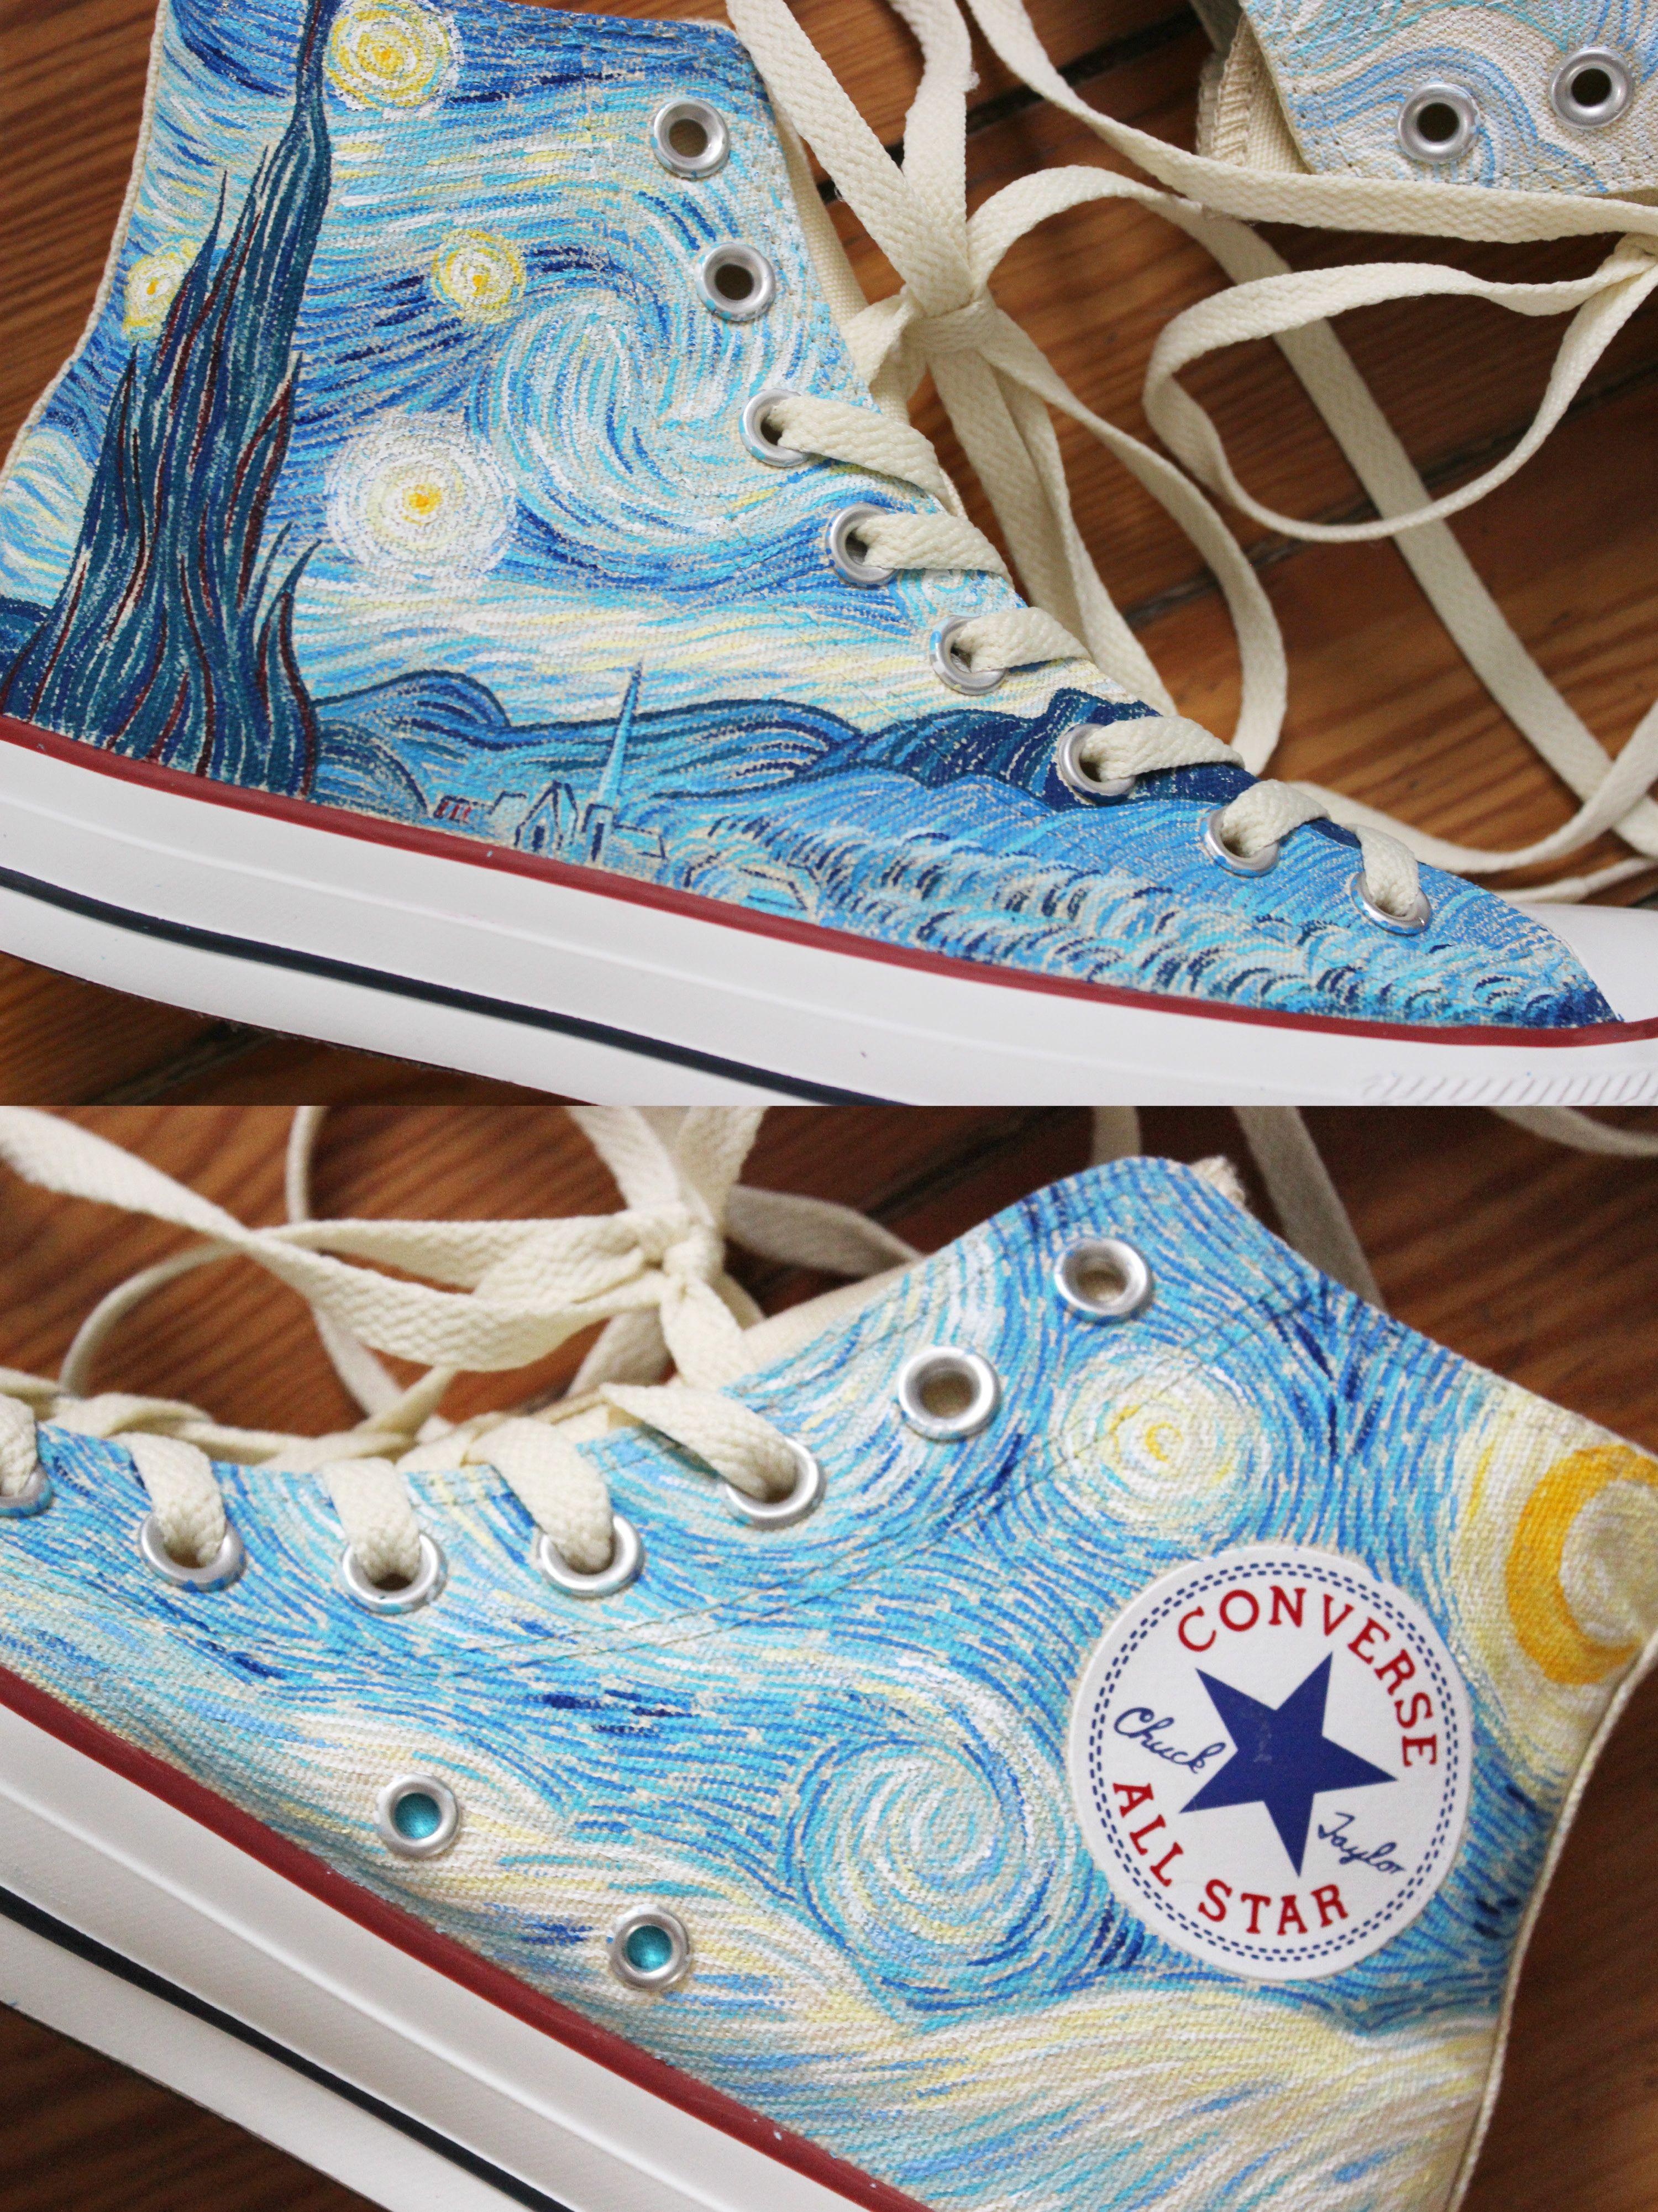 In Store On ShoesConverseCustom converse29 Shoes 2019Fashion 5Aj4L3R